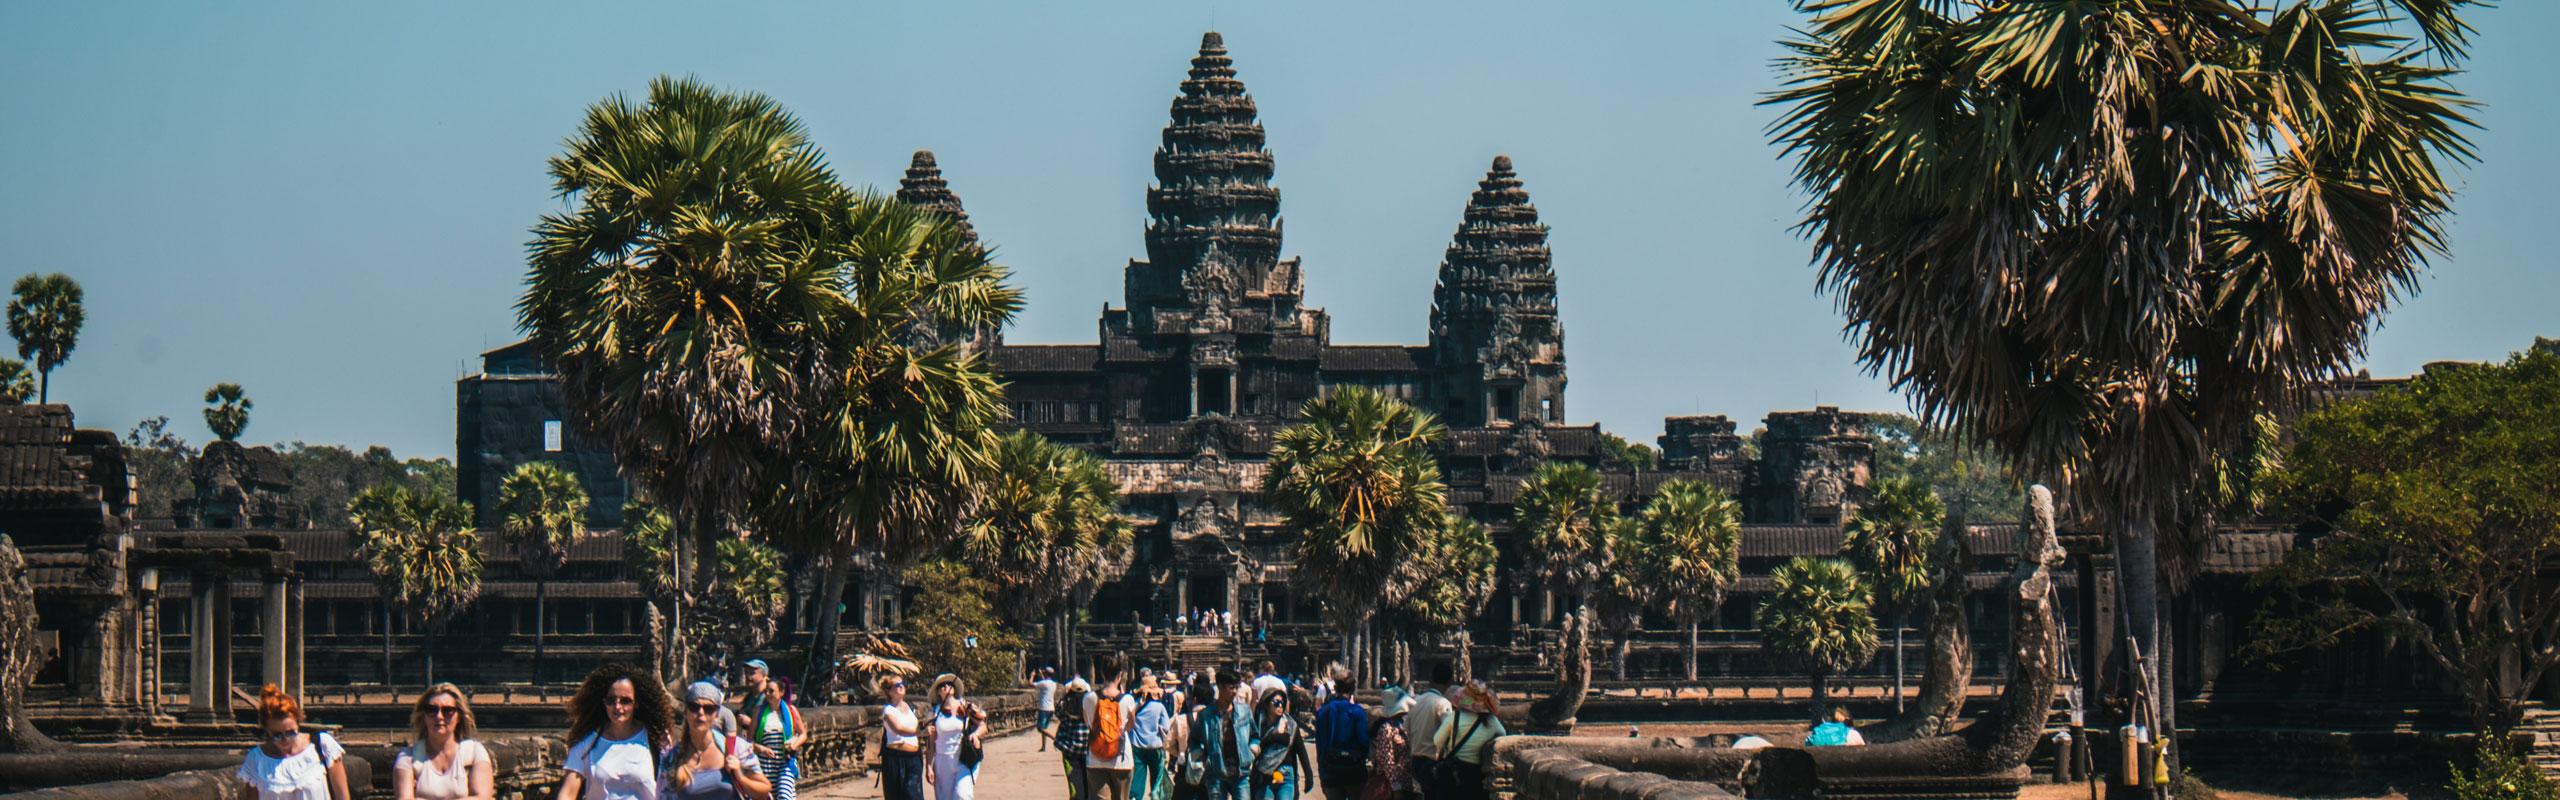 Indochina Highlights: Cambodia, Vietnam and Laos Tour